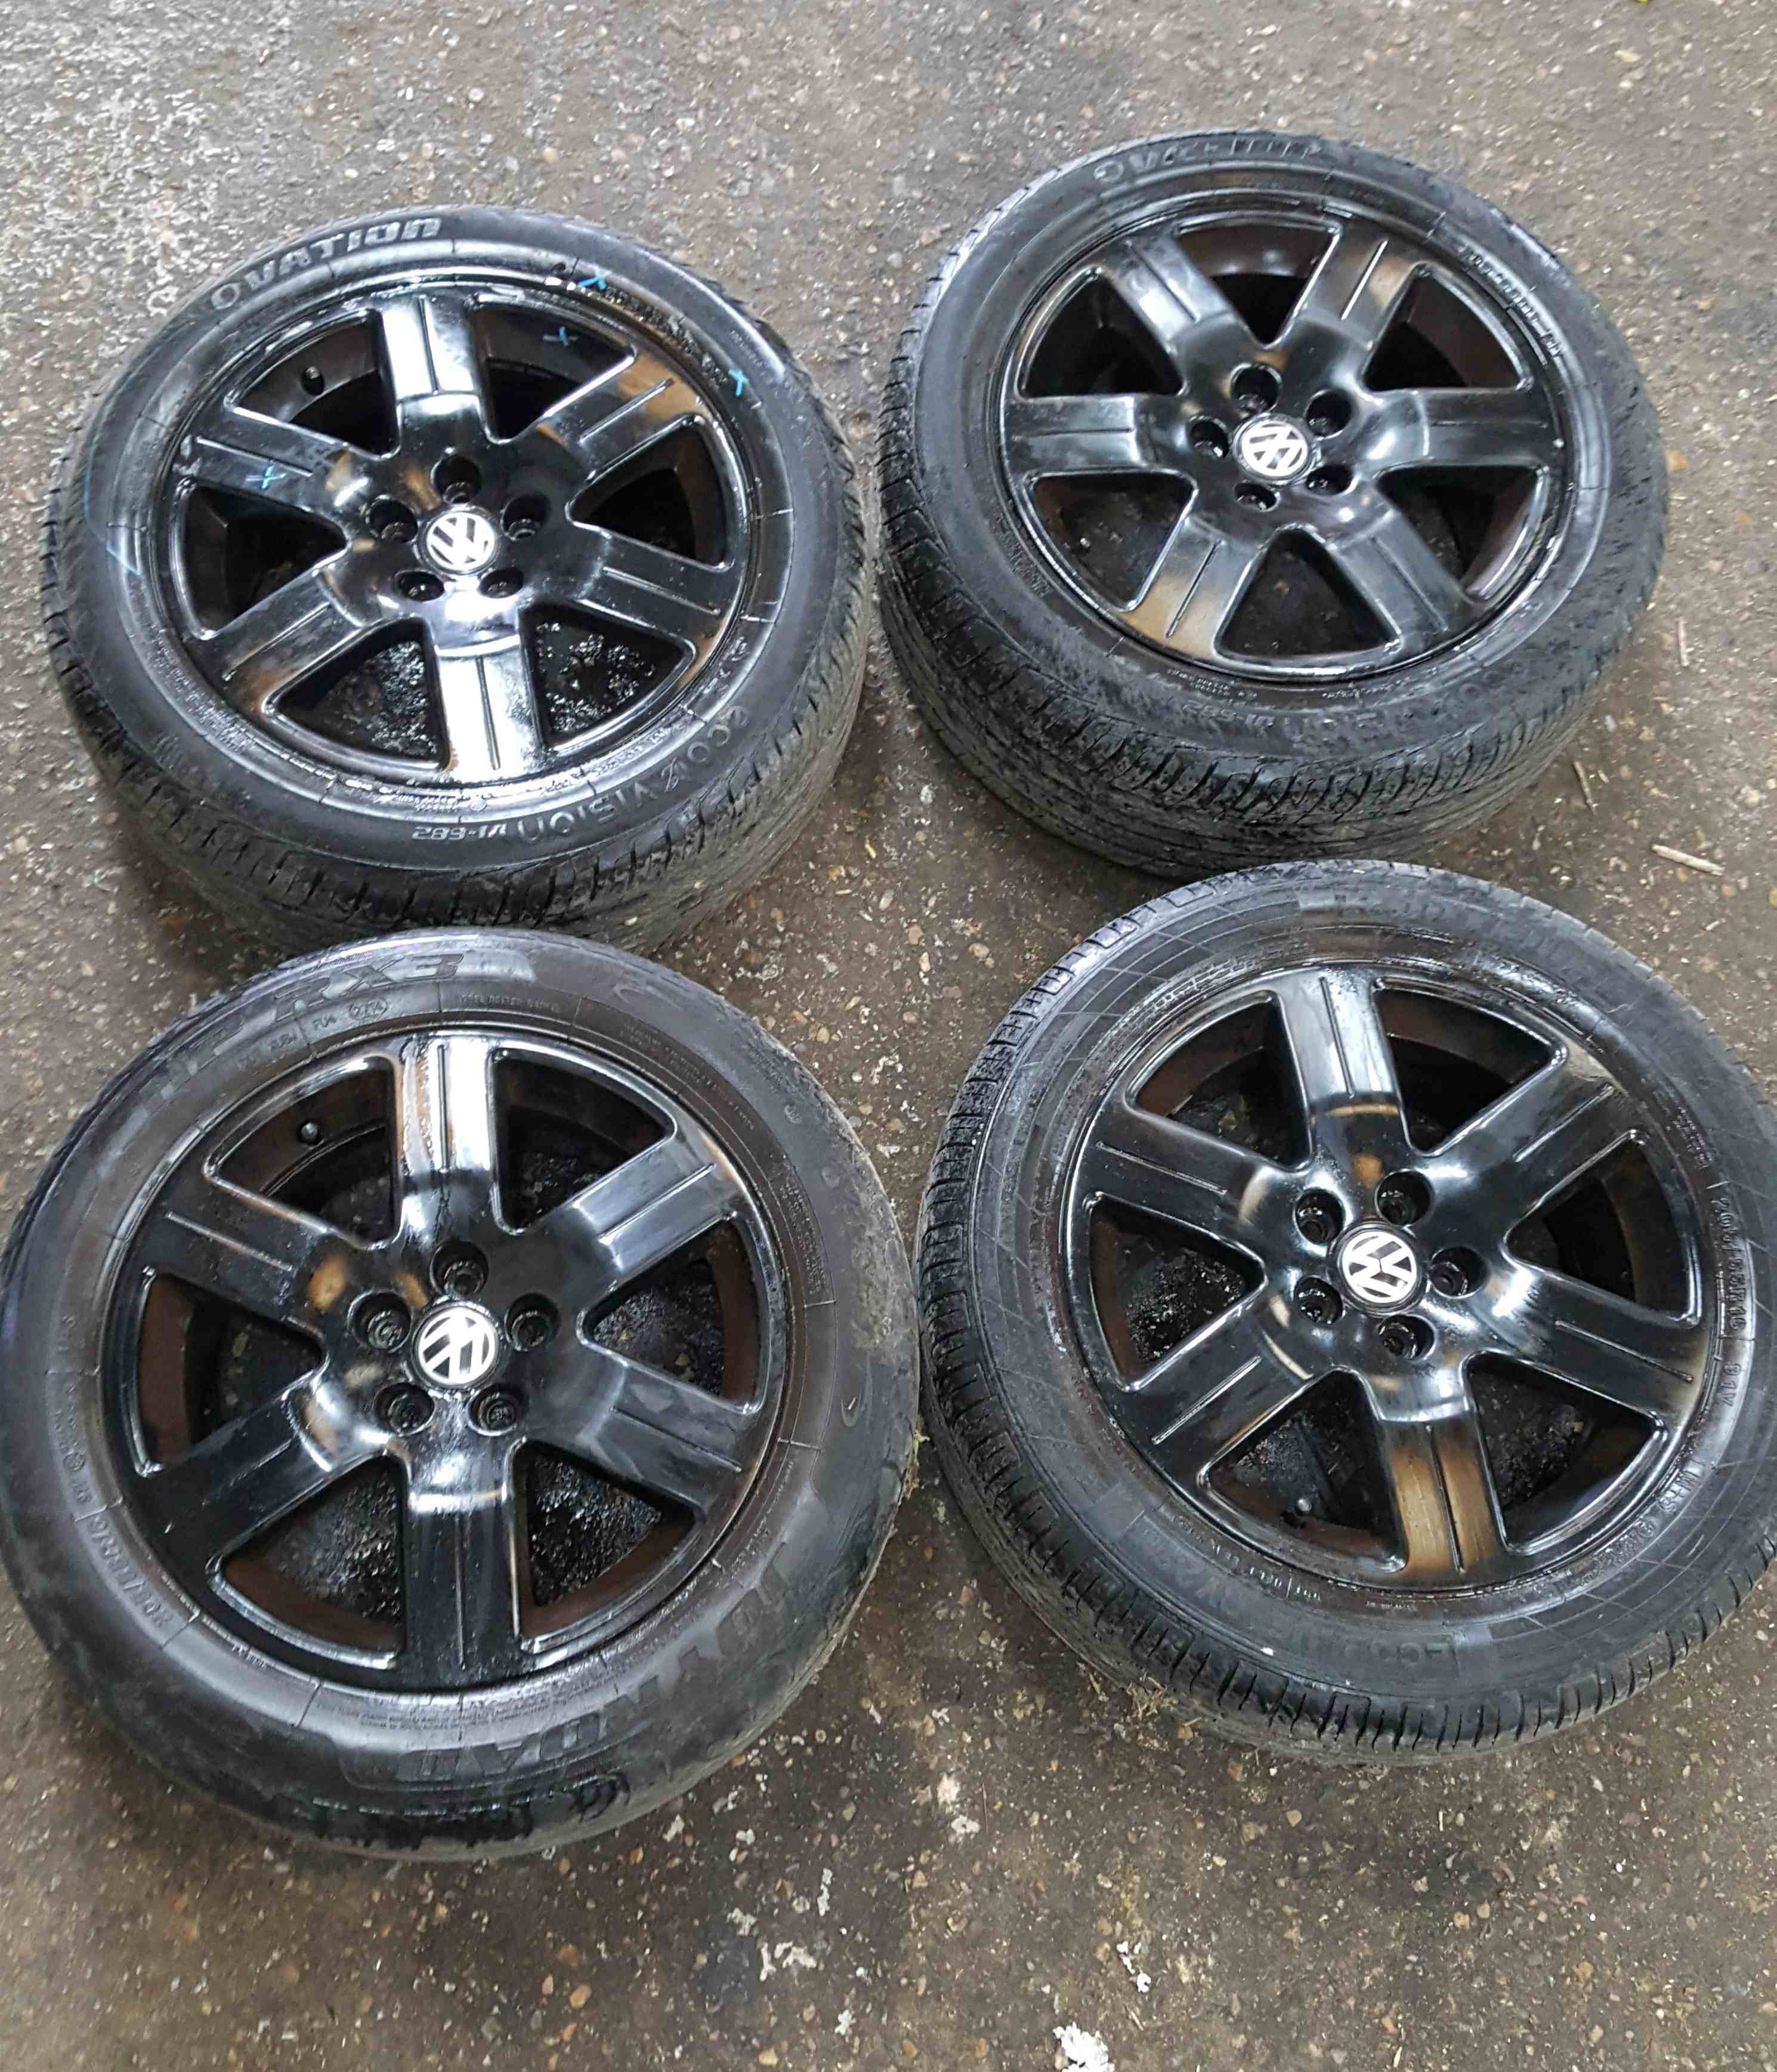 Volkswagen Beetle 1998-2006 Alloy Wheels Set Black 16inch X4 1C0601025AJ